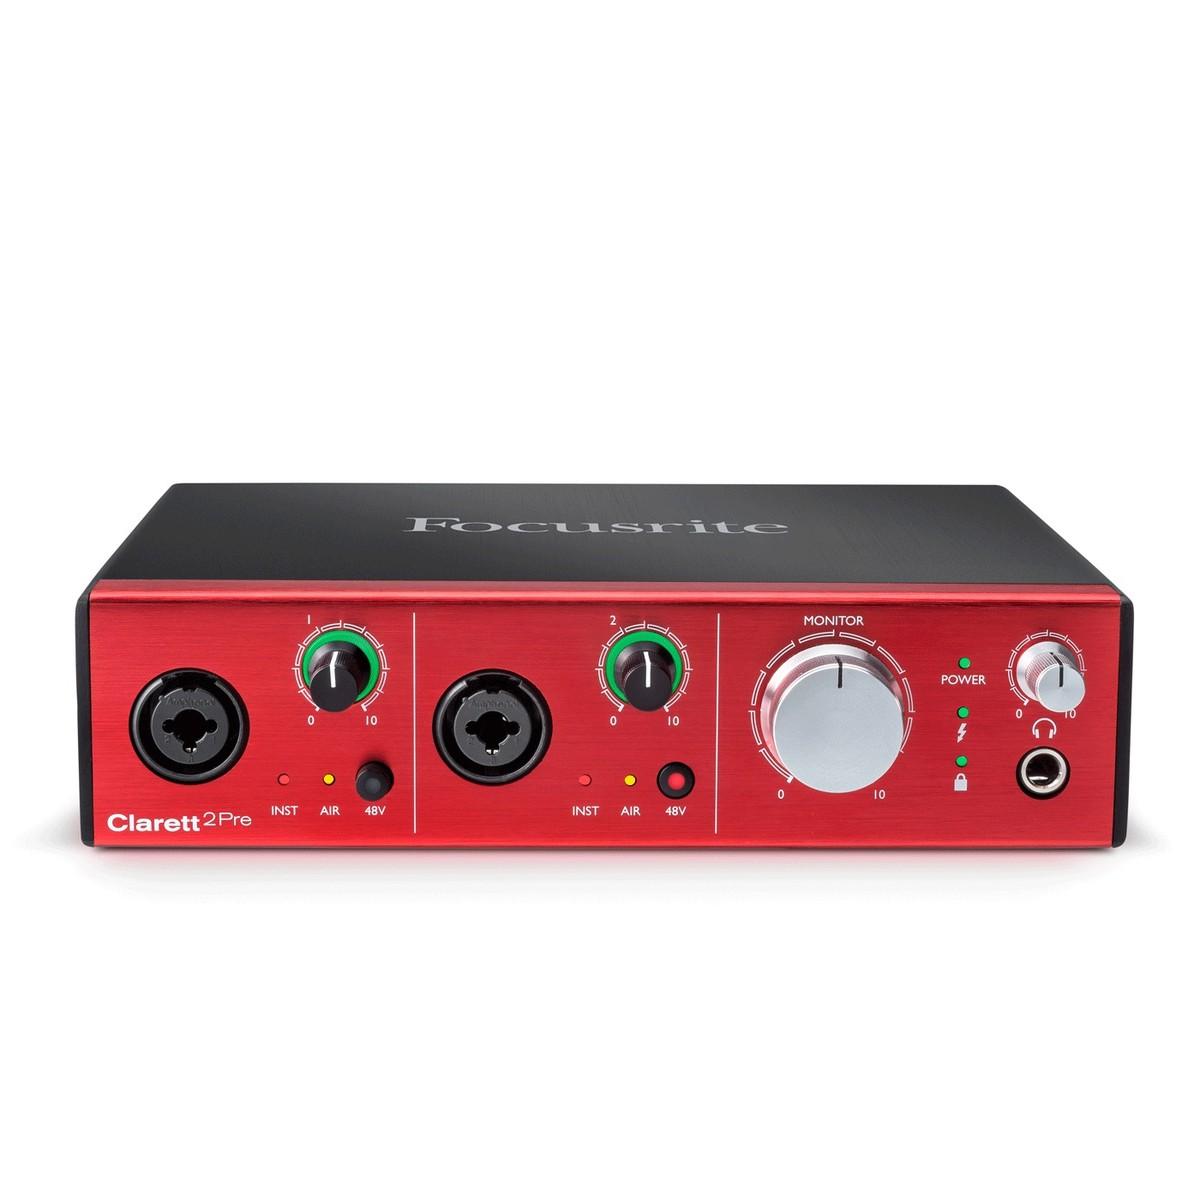 Recording Pro Audio Home Recording Studio likewise Red 4pre moreover Focusrite Clarett 8pre 18 In 20 Out Thunderbolt Audio Midi Interface W 8 Pre s 17531 further Trinnov Processor D Mon8 V0 besides Setup Diagrams. on thunderbolt audio interface focusrite